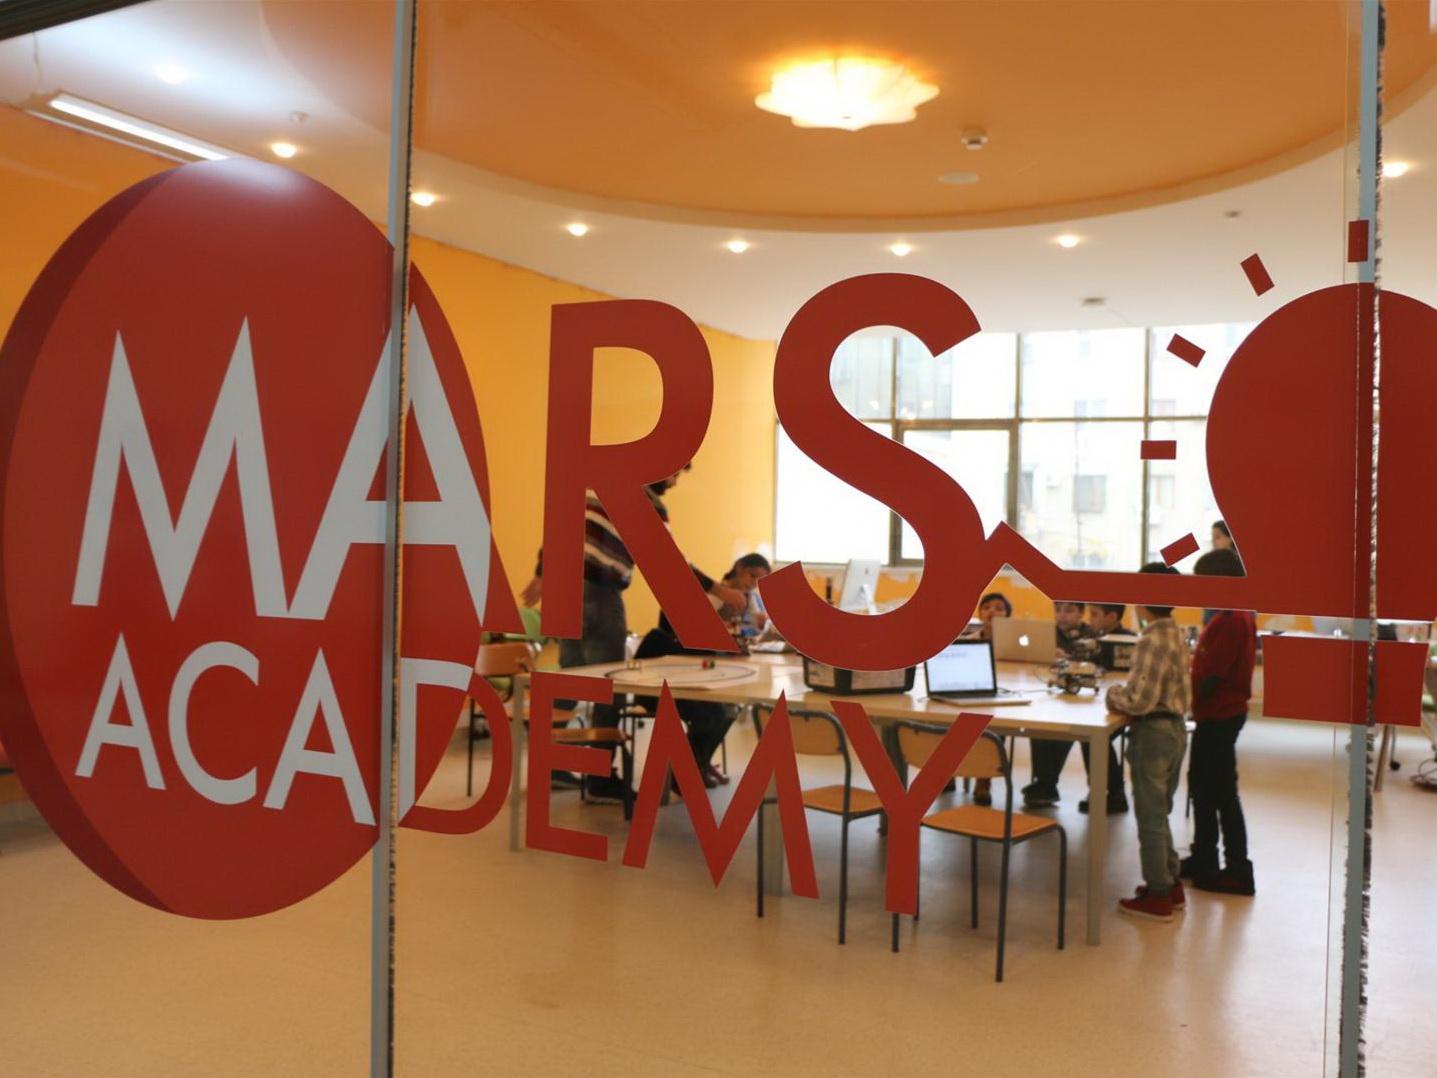 Mars Academy